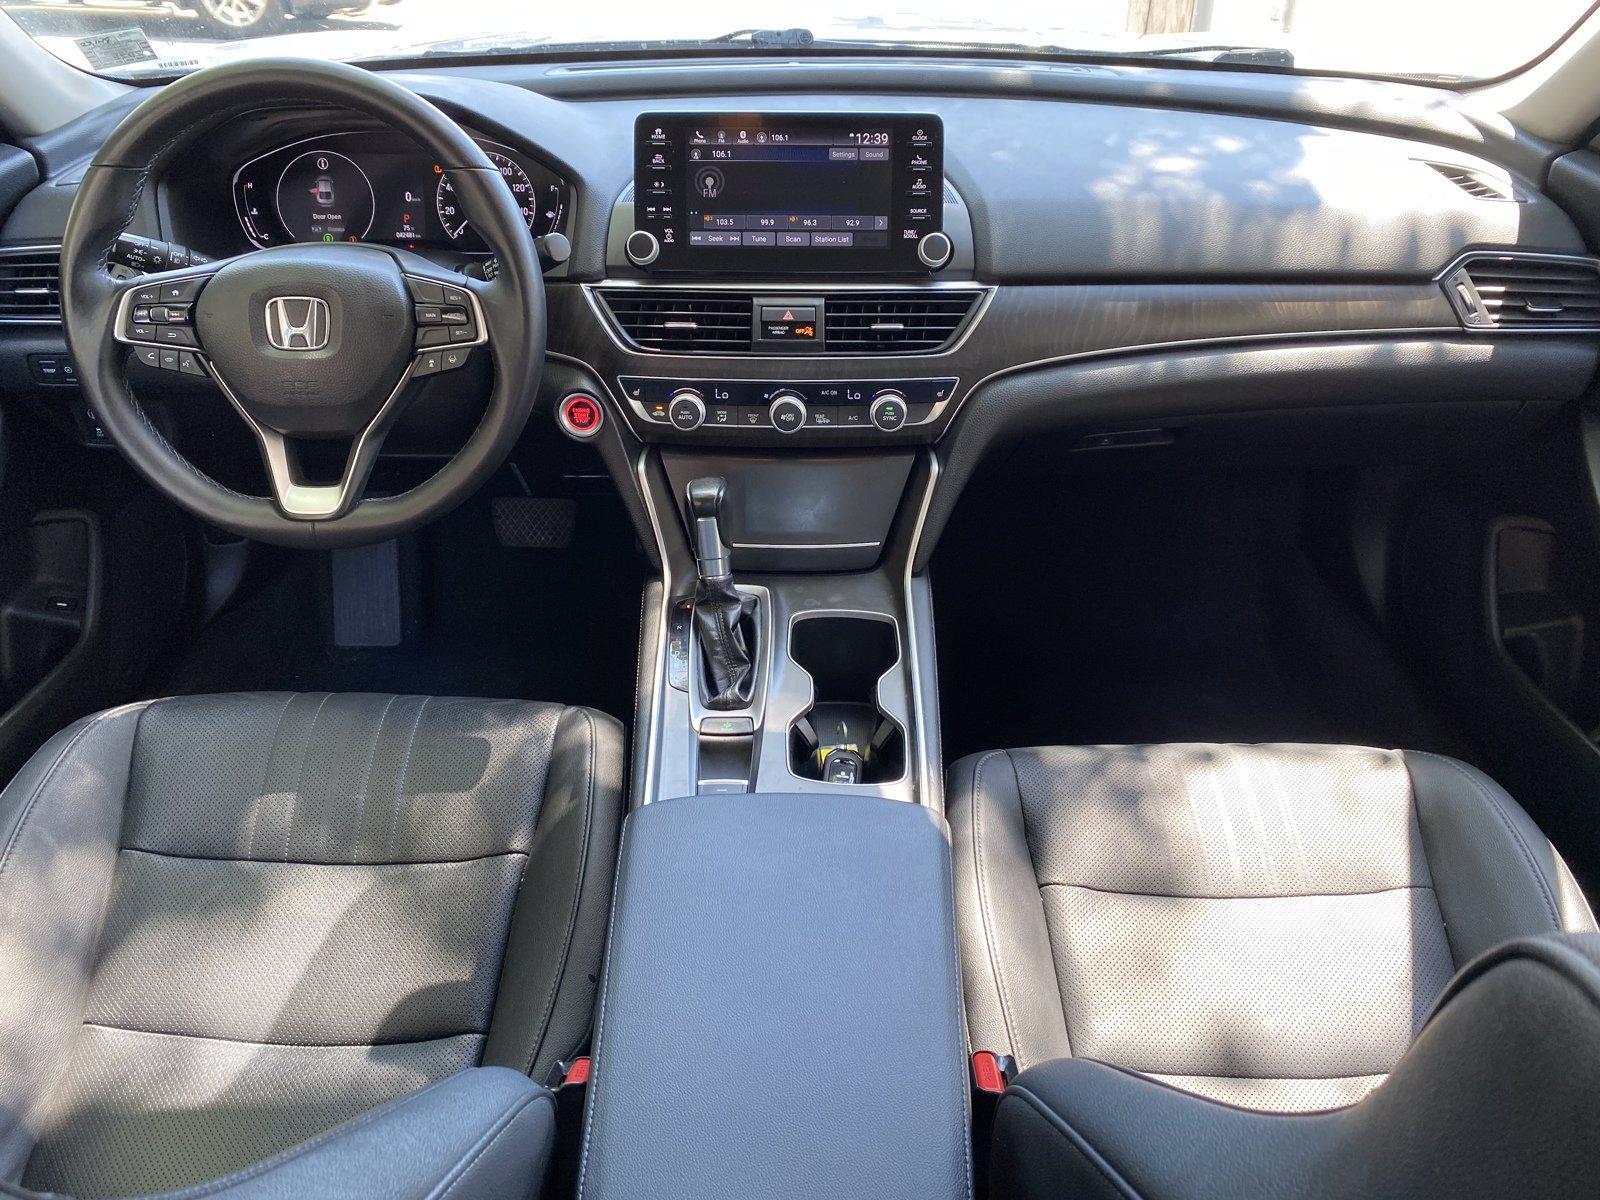 Used-2019-Honda-Accord-Sedan-EX-L-15T